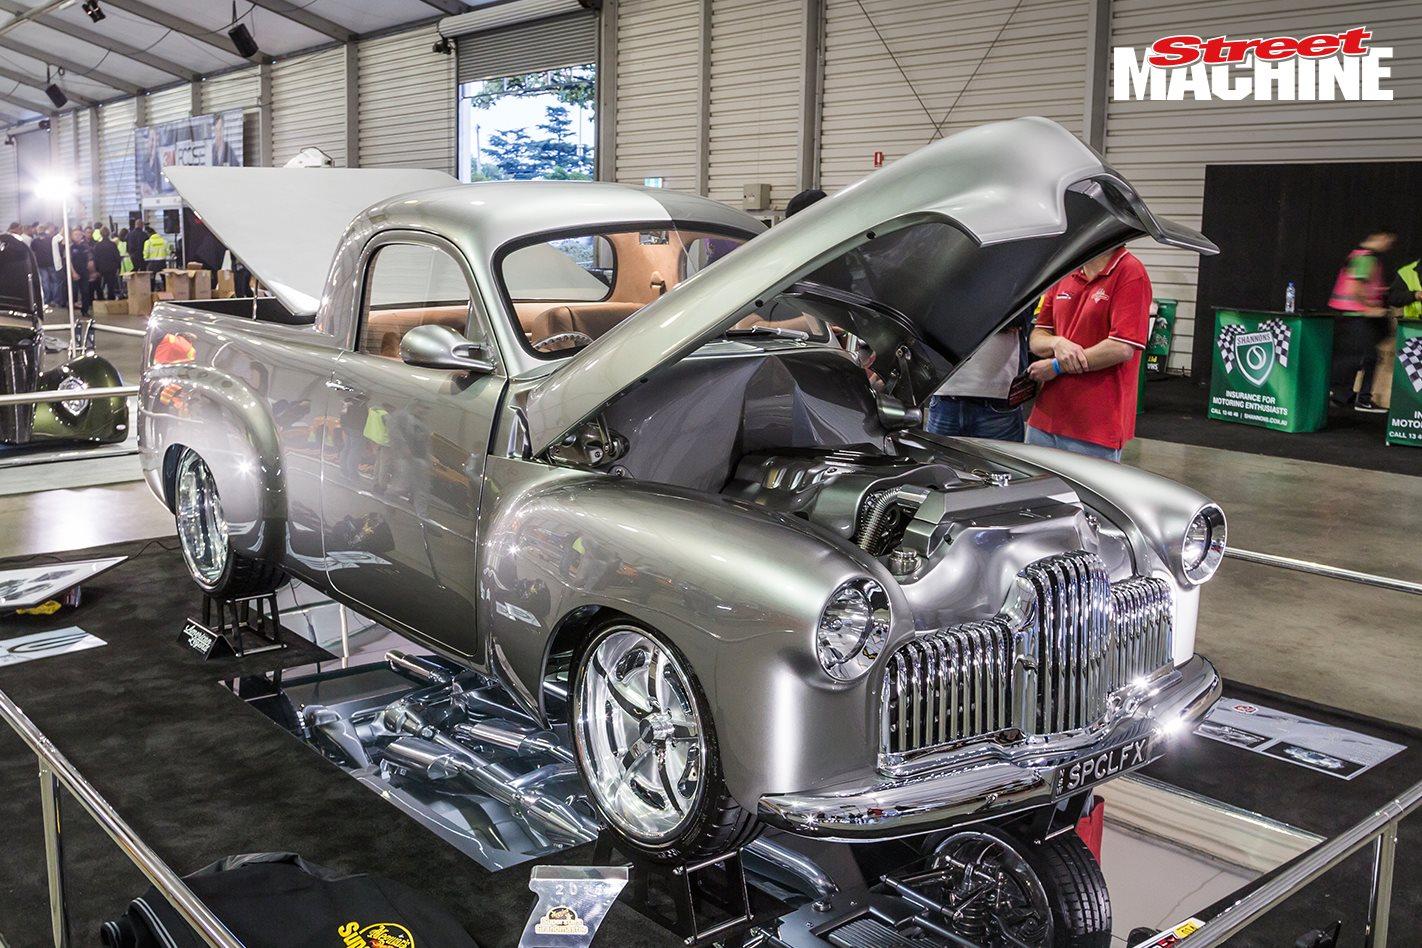 SPCLFX custom FX Holden Ute at MotorEx 2018 – Video